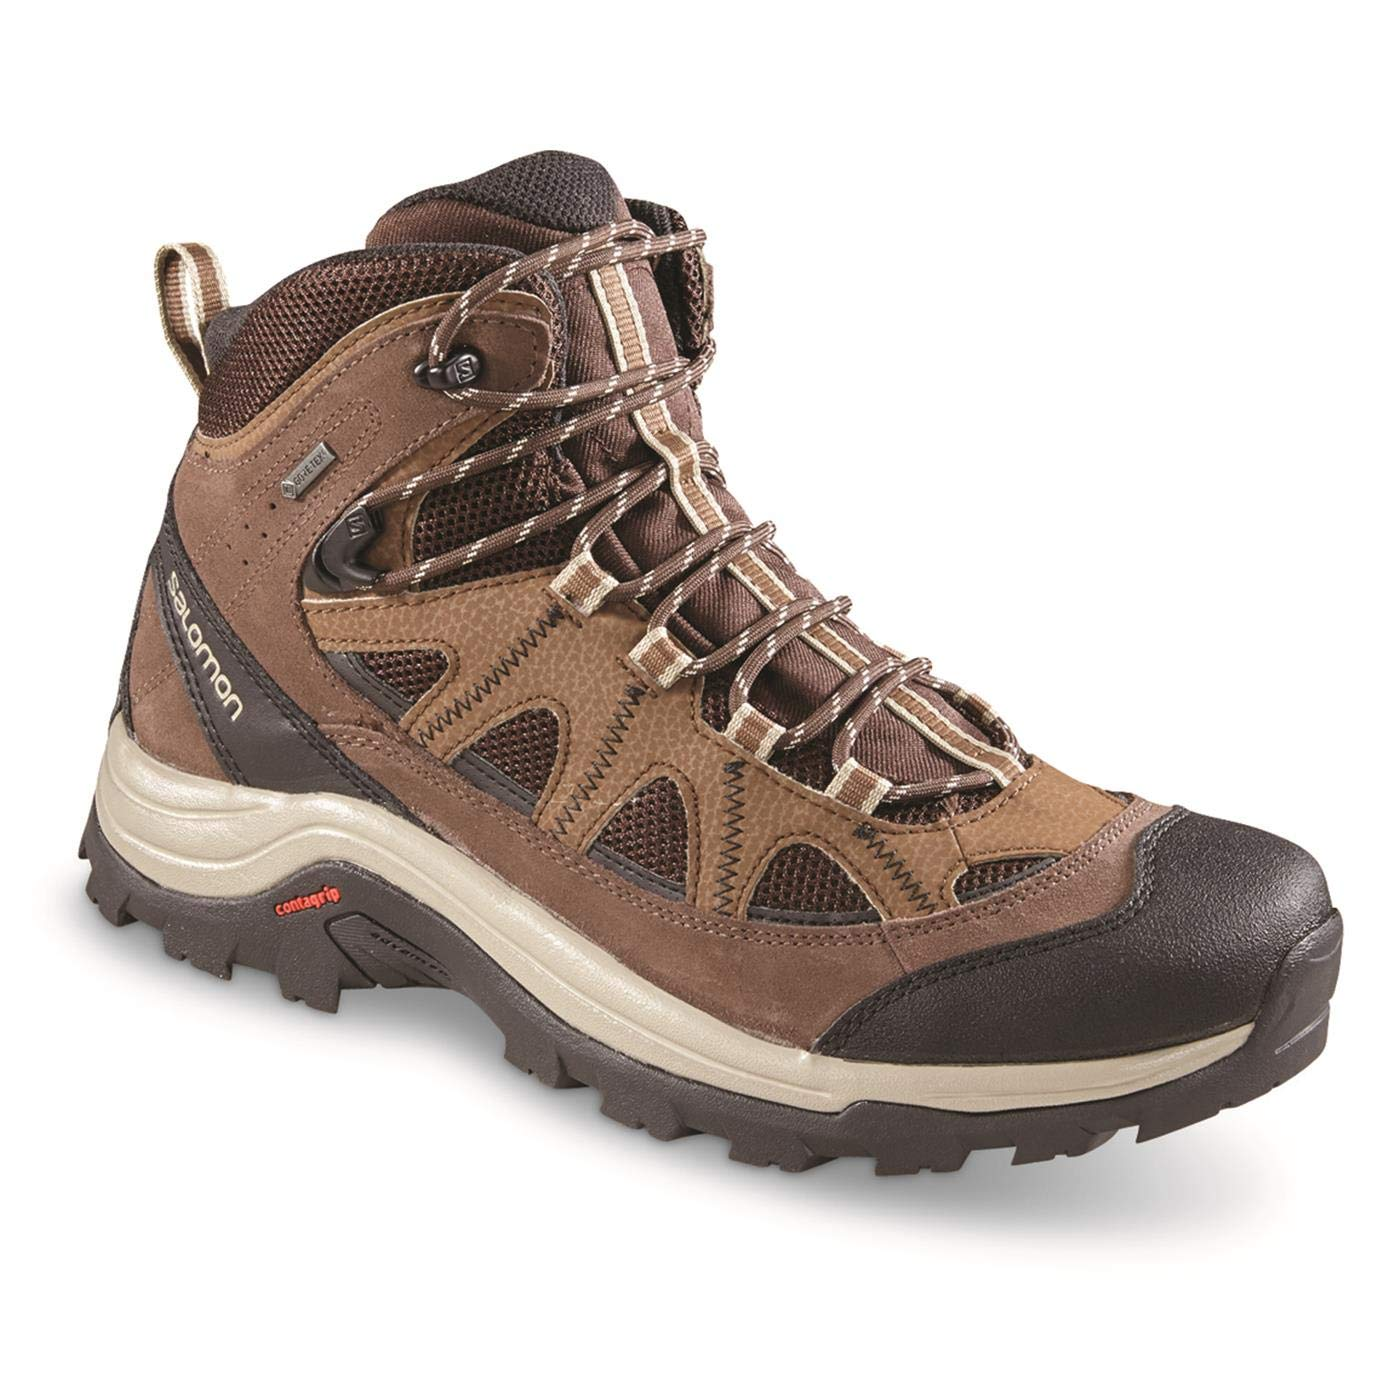 aafbe8b005ea Galleon - Salomon Authentic LTR GTX Boot - Men s Black Coffee Chocolate  Brown Vintage Kaki 12.5